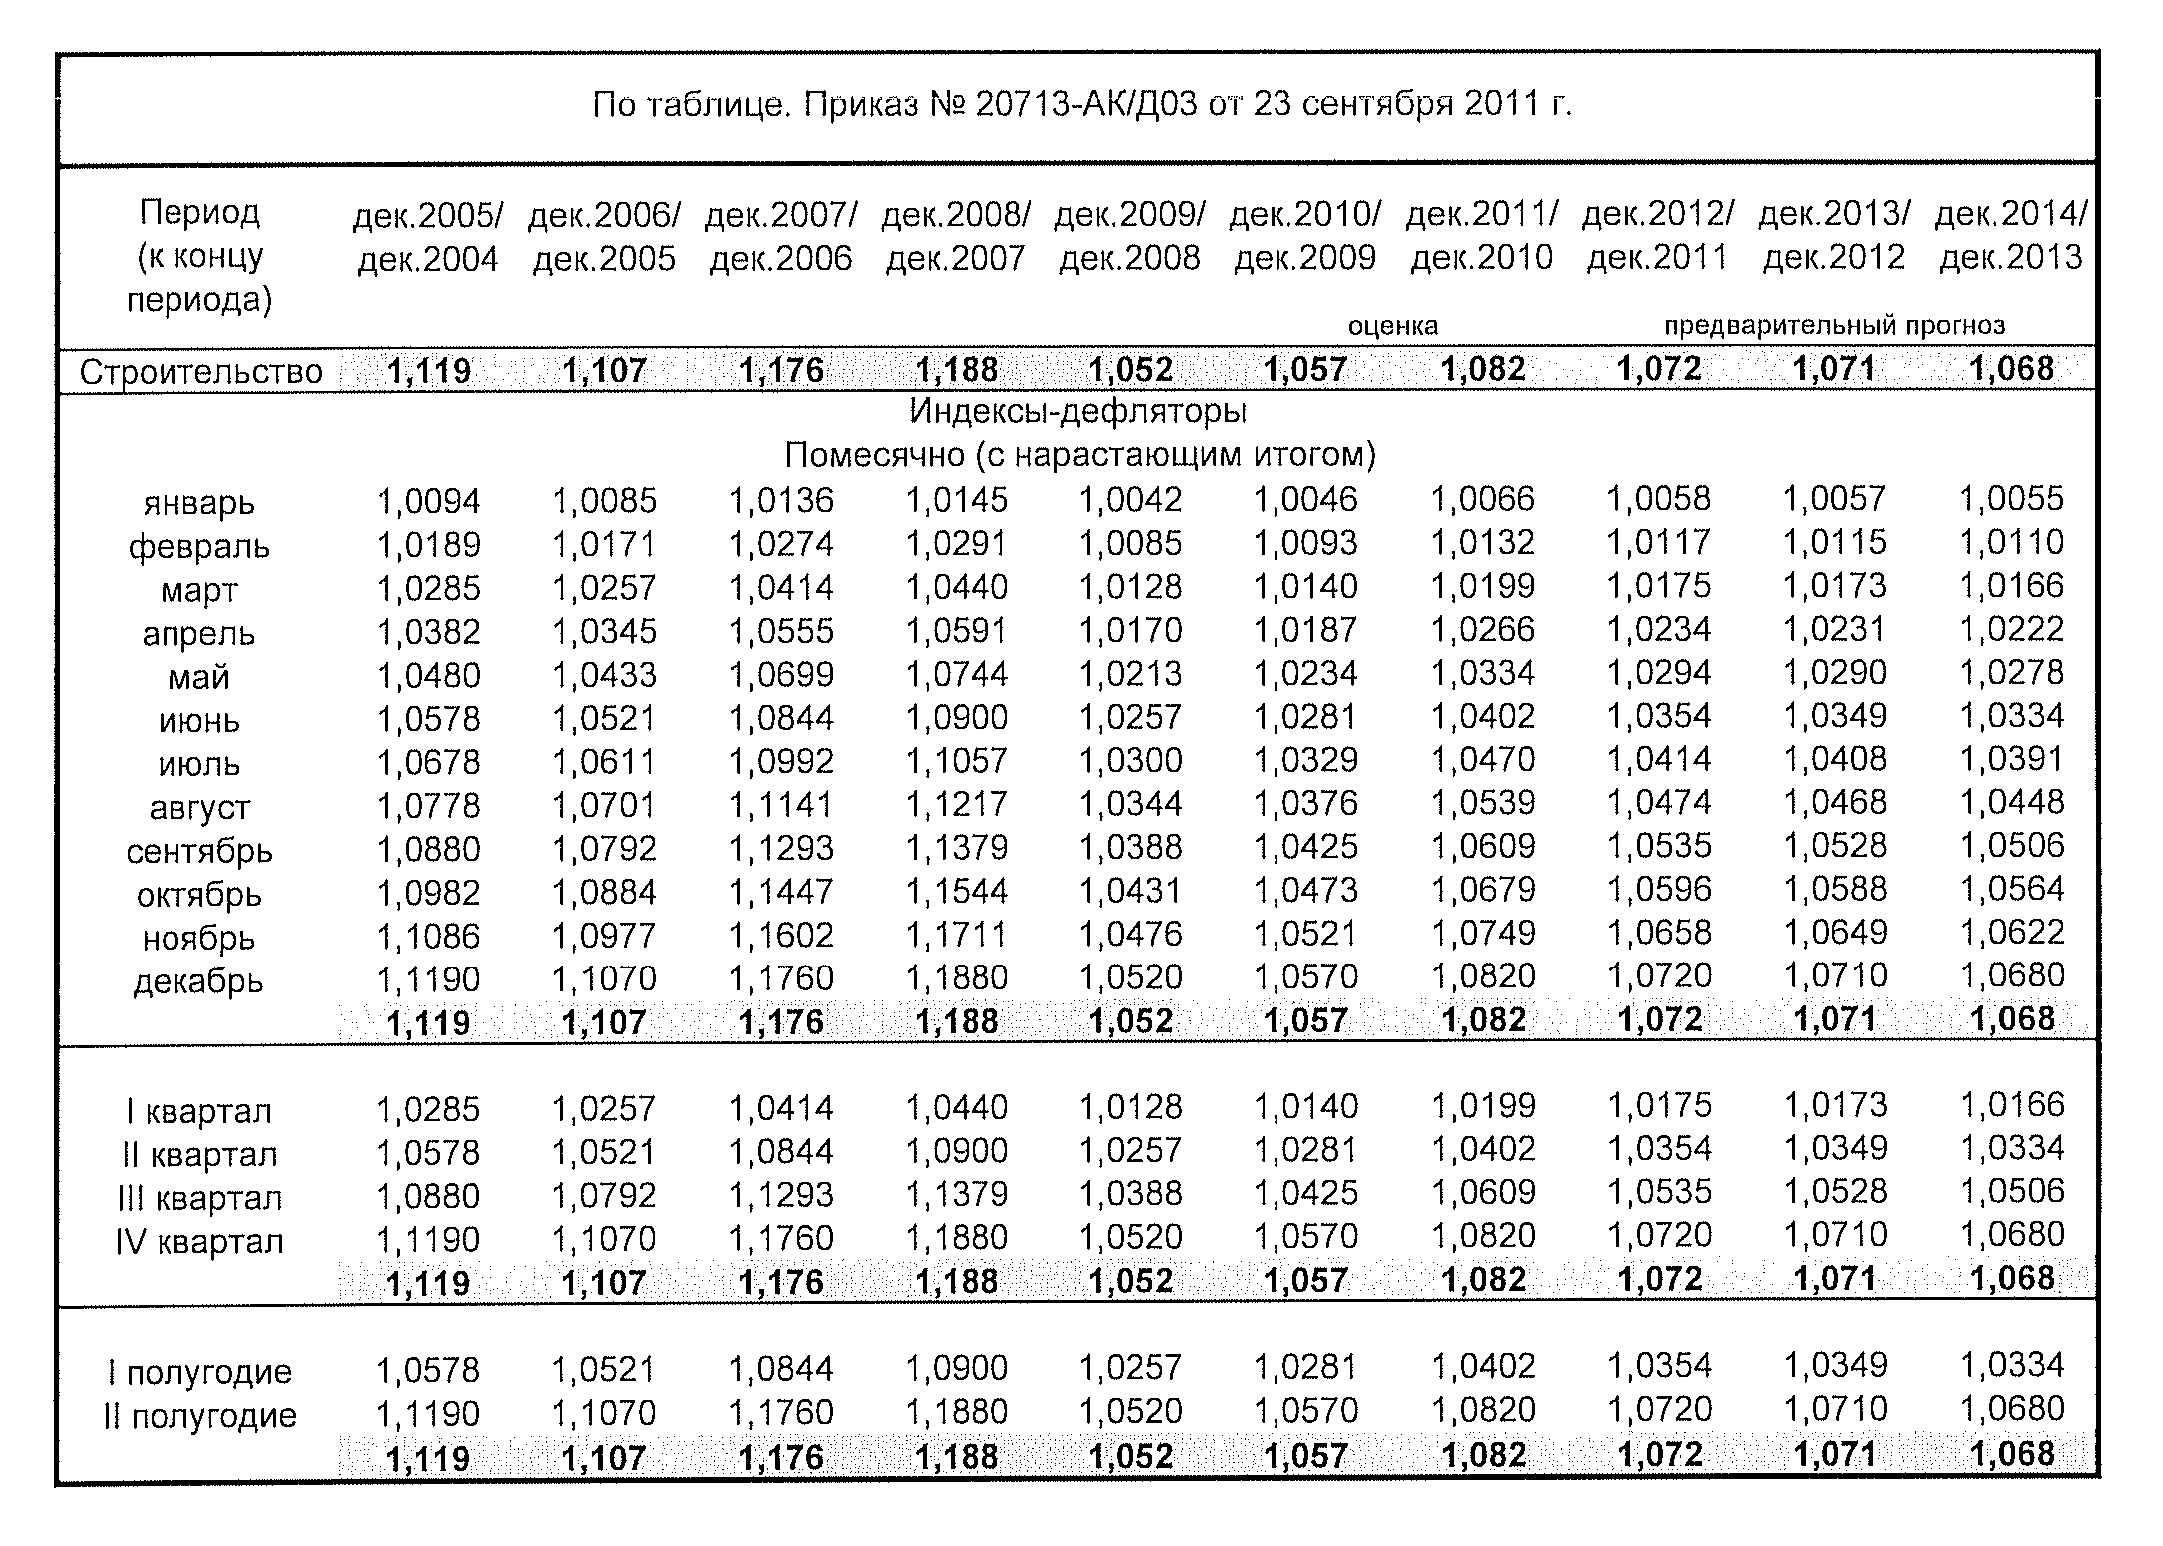 Индексы-дефляторы на период до 2018 года